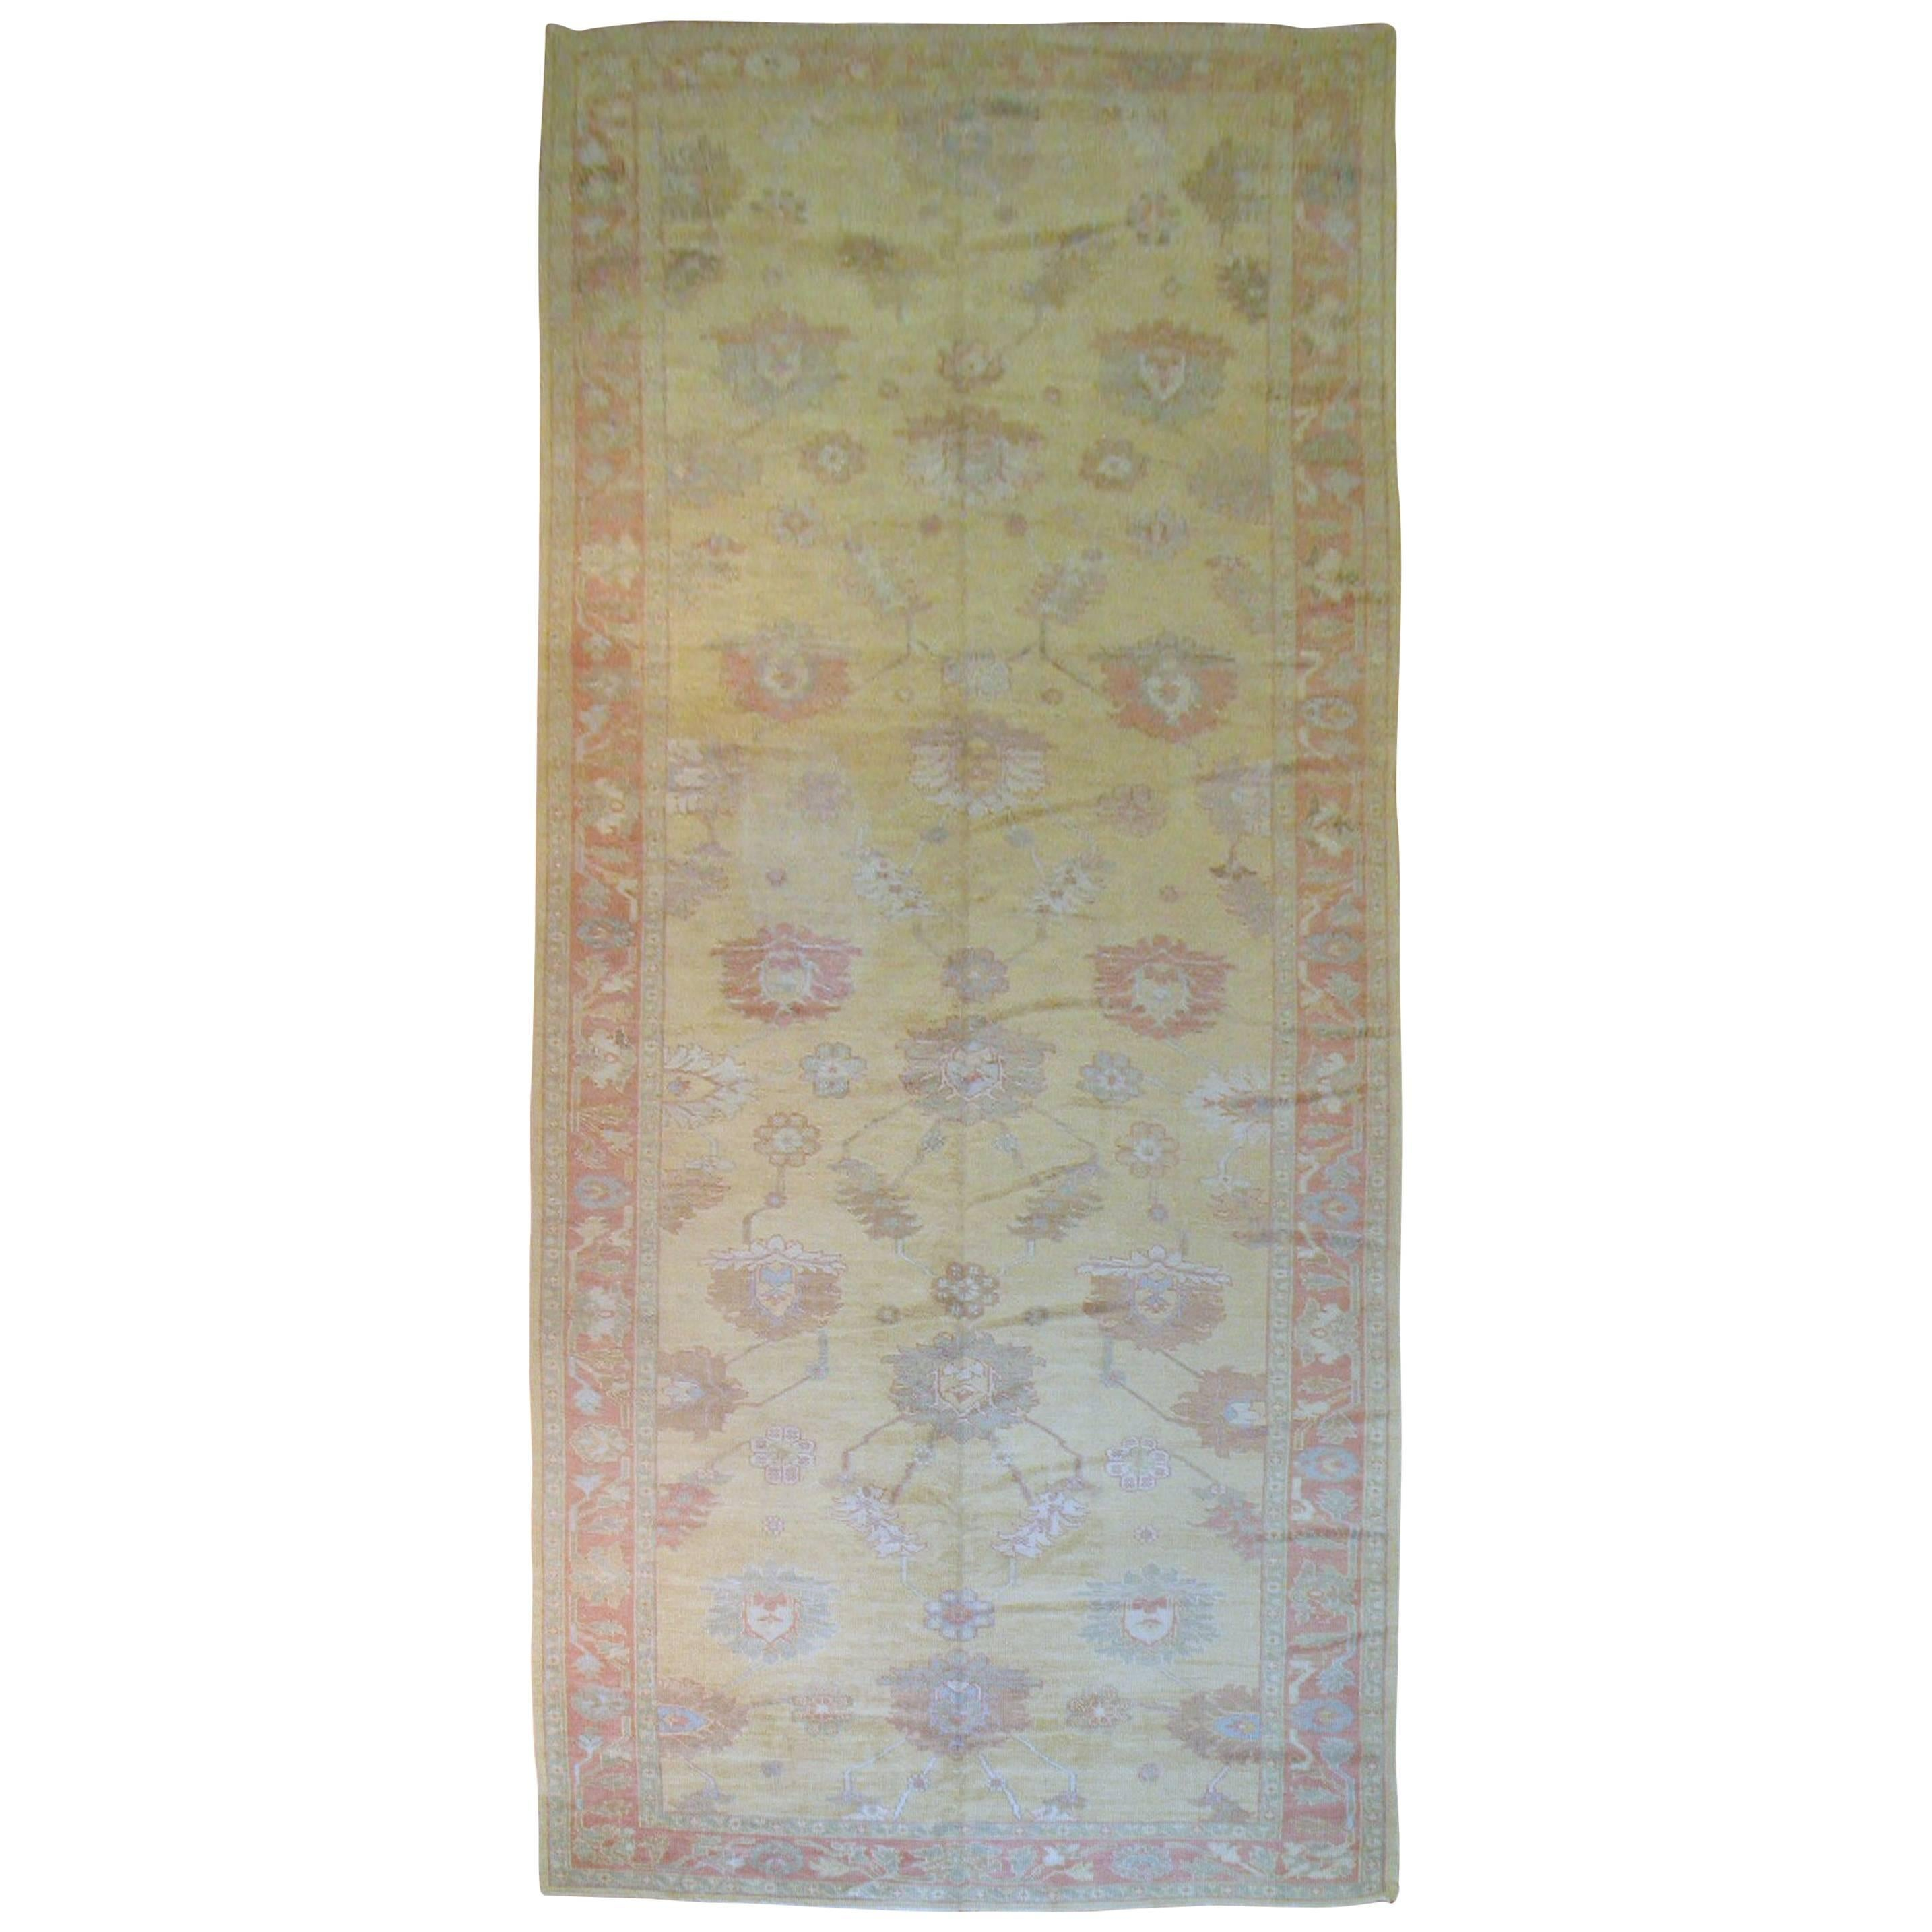 Vintage Inspired Corridor Size Turkish Oushak Rug